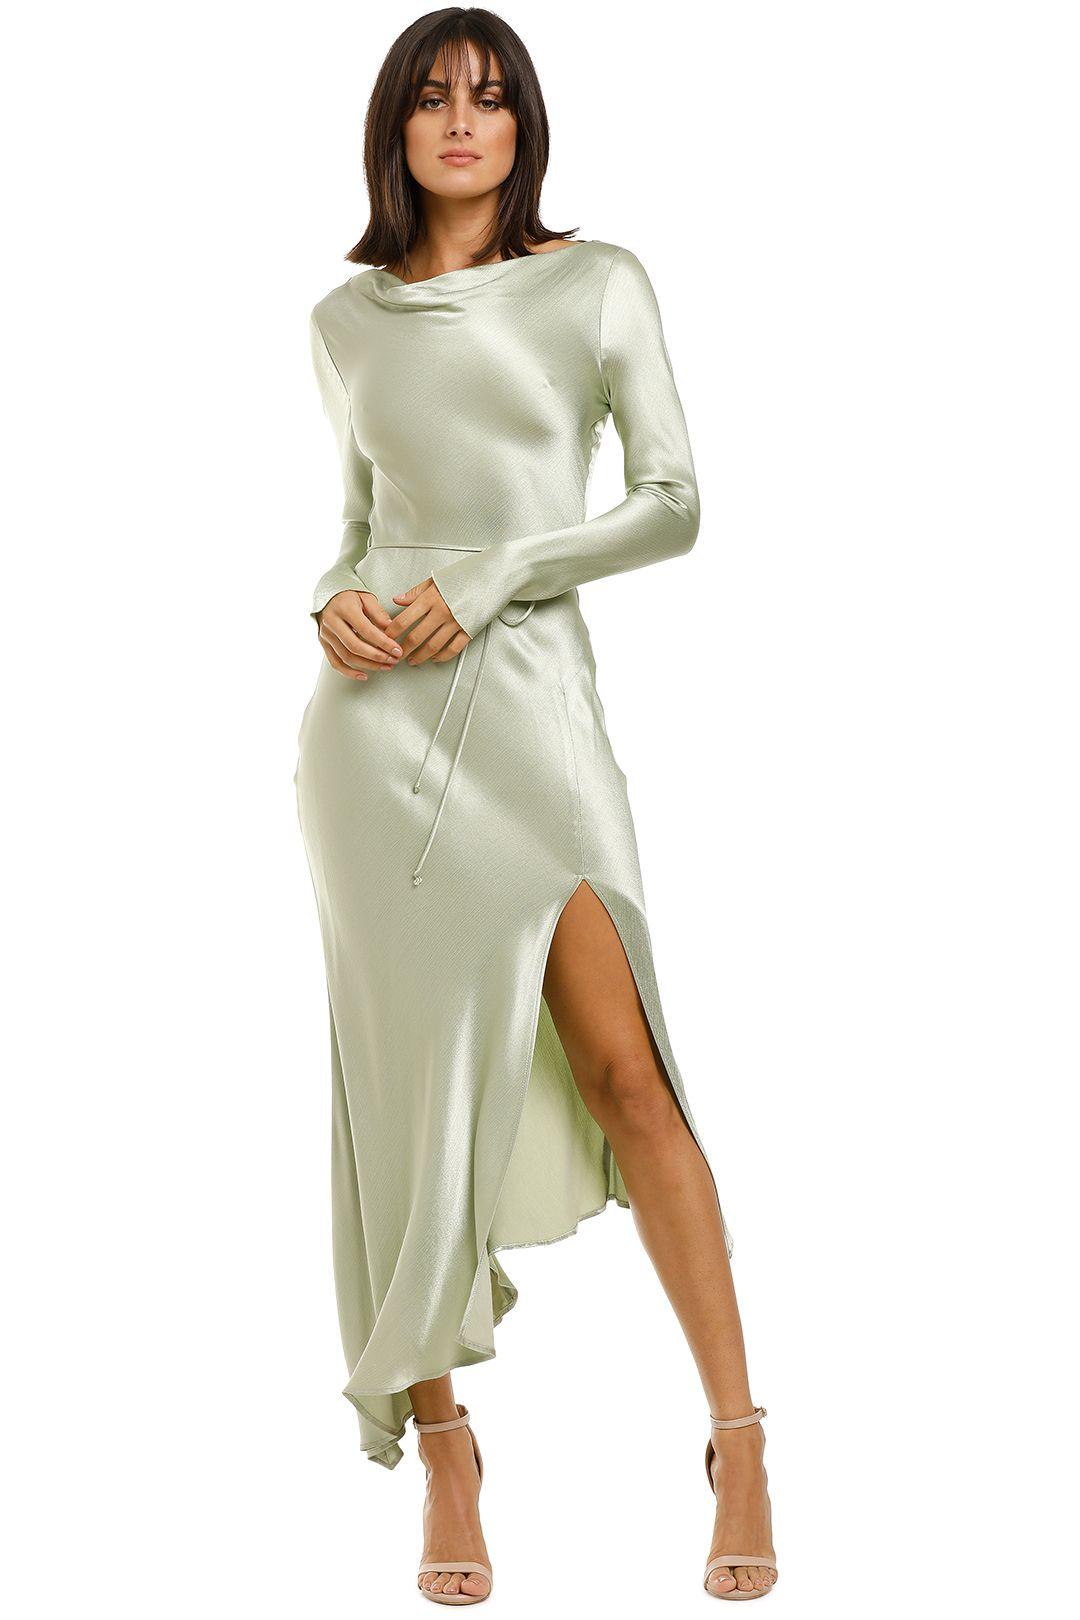 Bec-and-Bridge-Crest-LS-Midi-Dress-Peppermint-Front